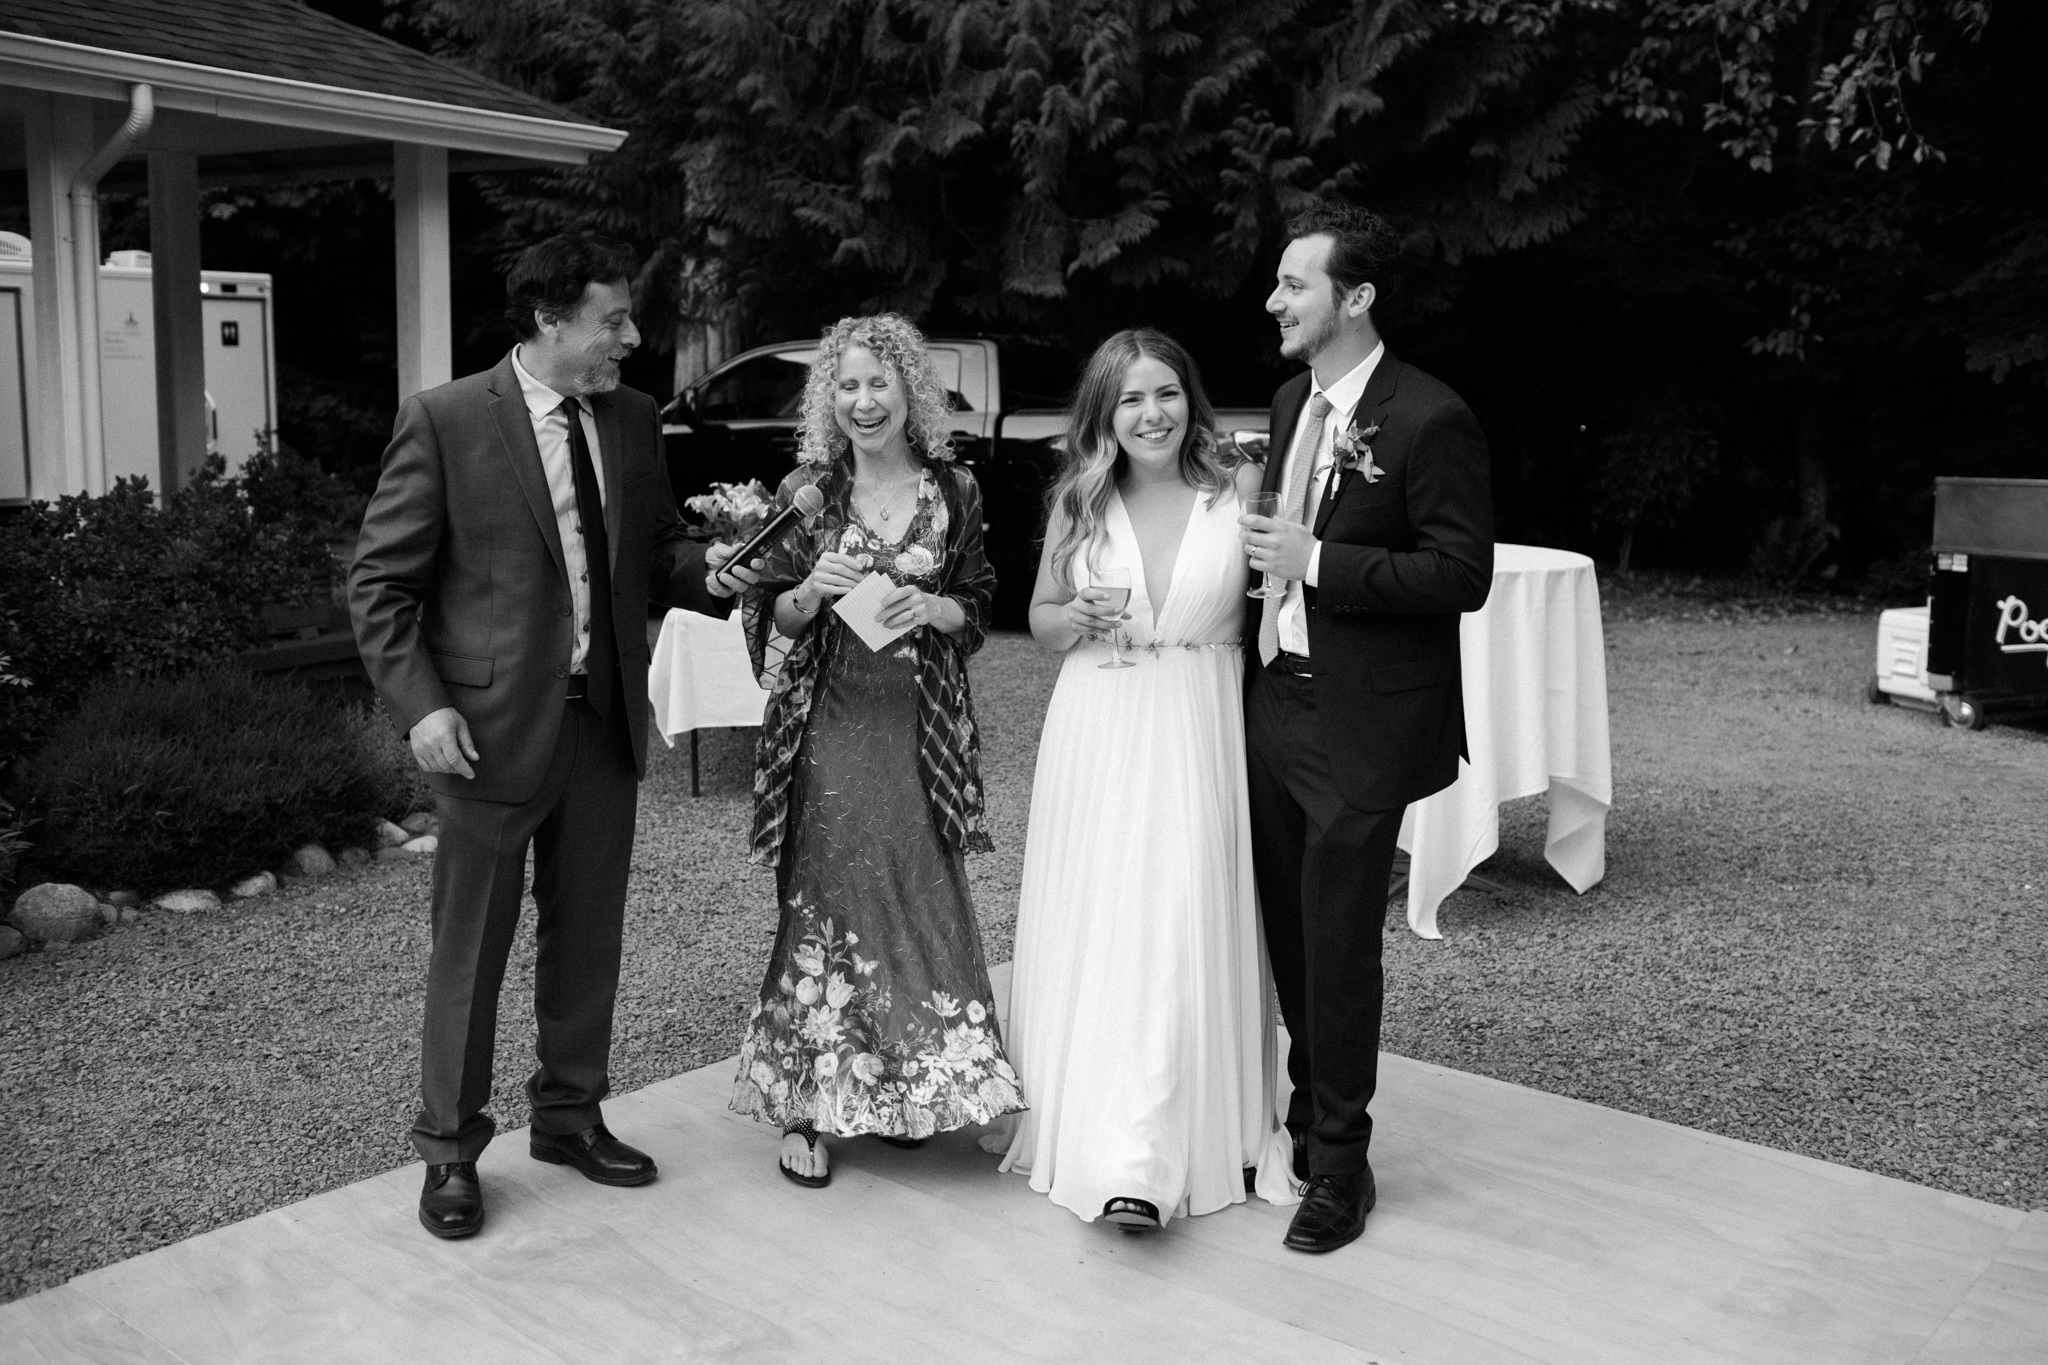 Backyard-Bainbridge-Island-Wedding-Alycia-Lovell-Photography-189.JPG